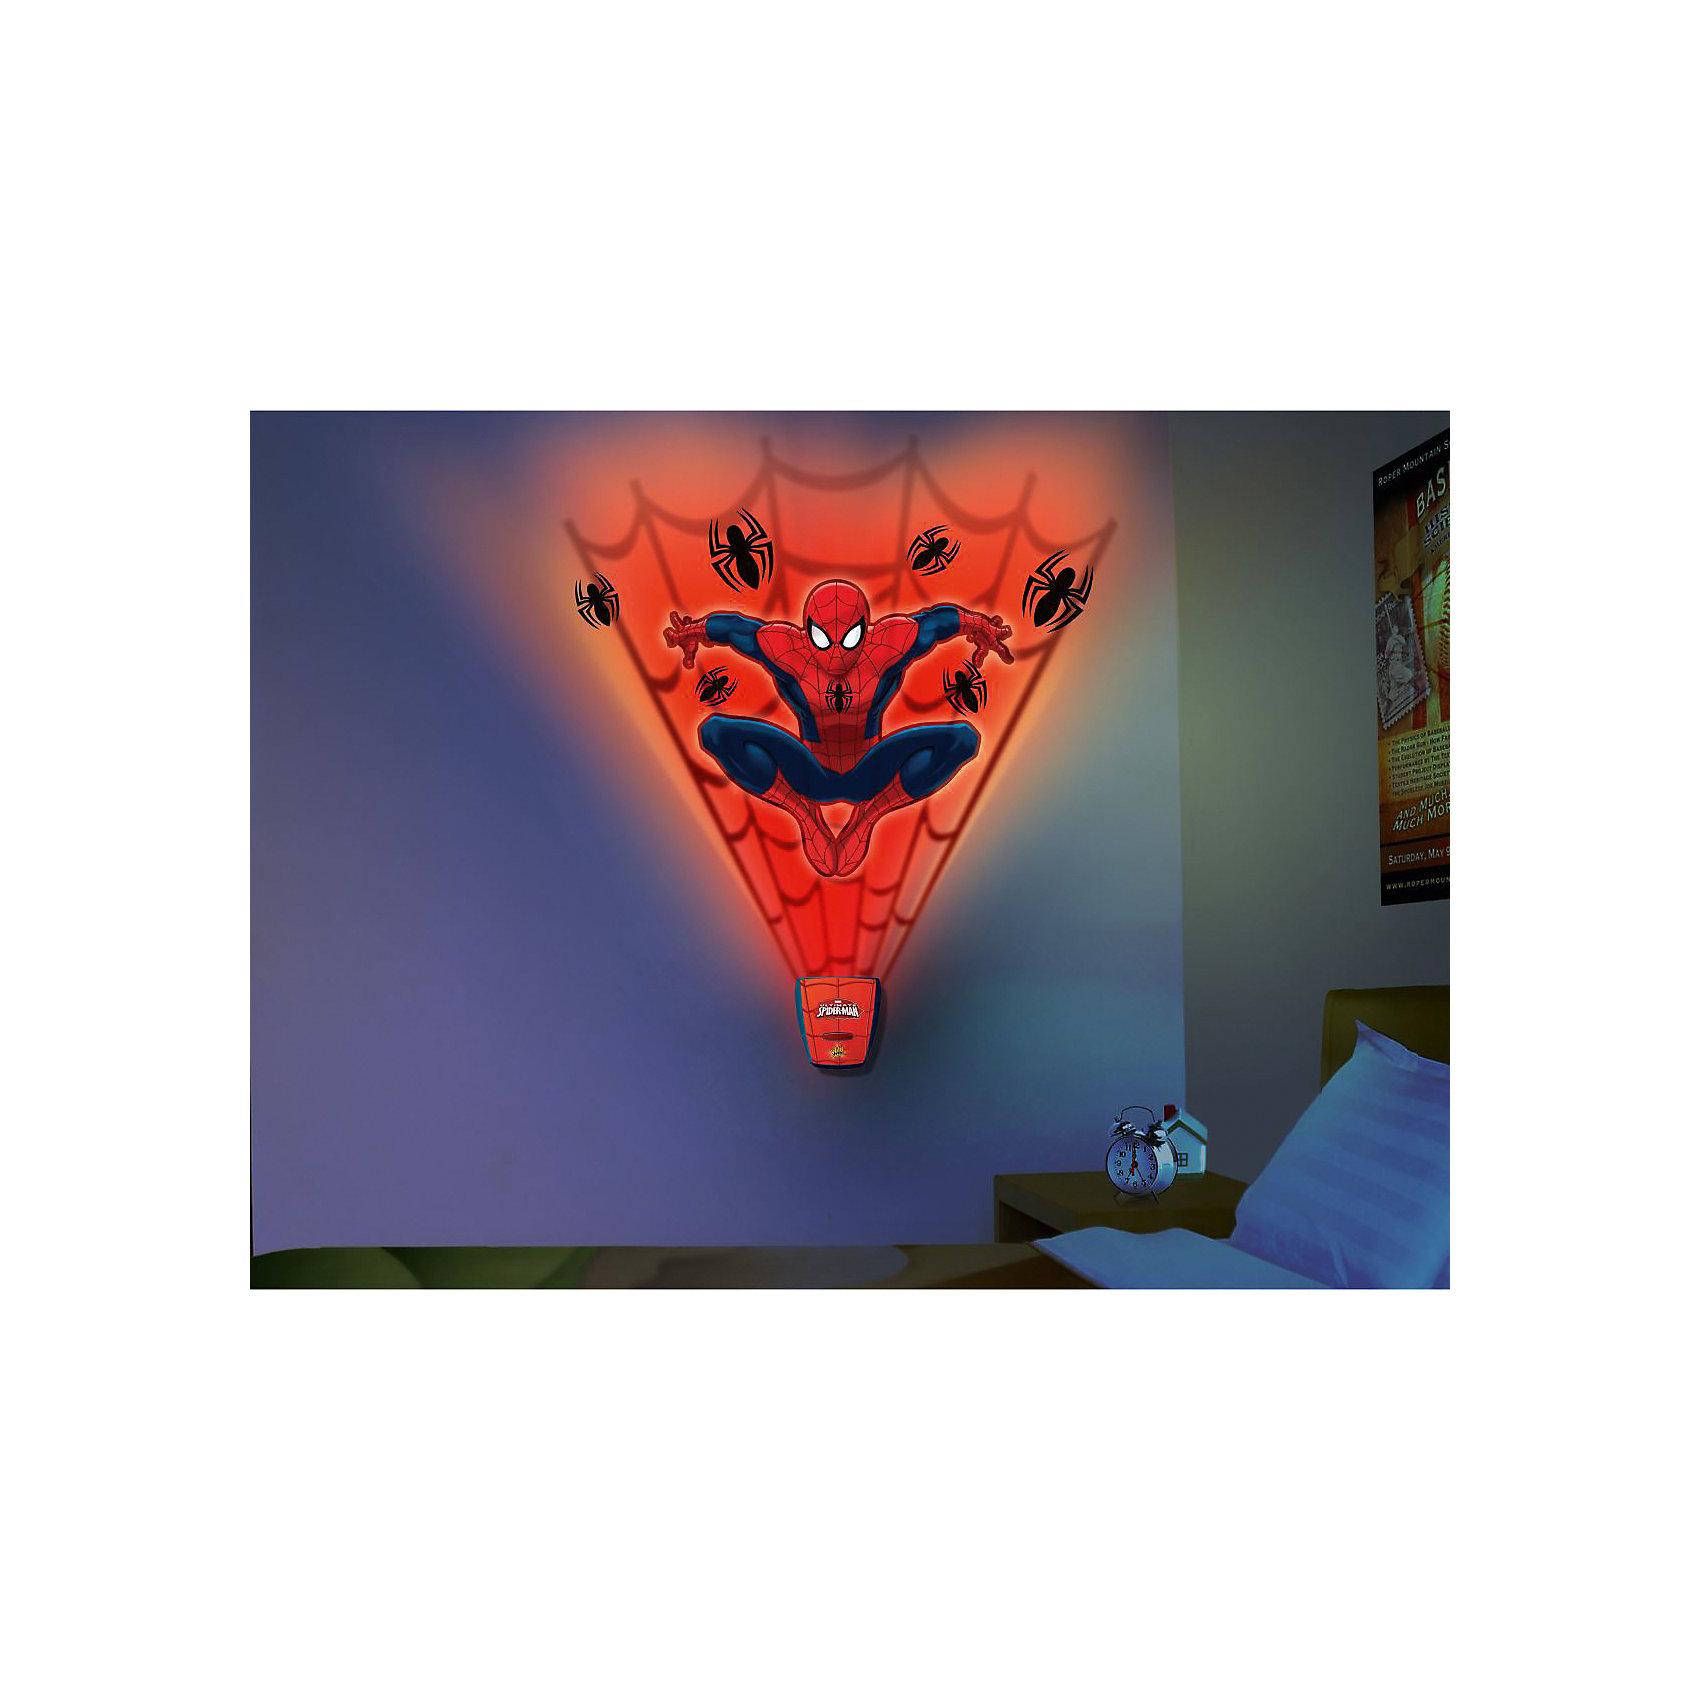 Jazwares Настенный проектор Паутина, Человек-Паук jazwares настенный проектор паутина человек паук